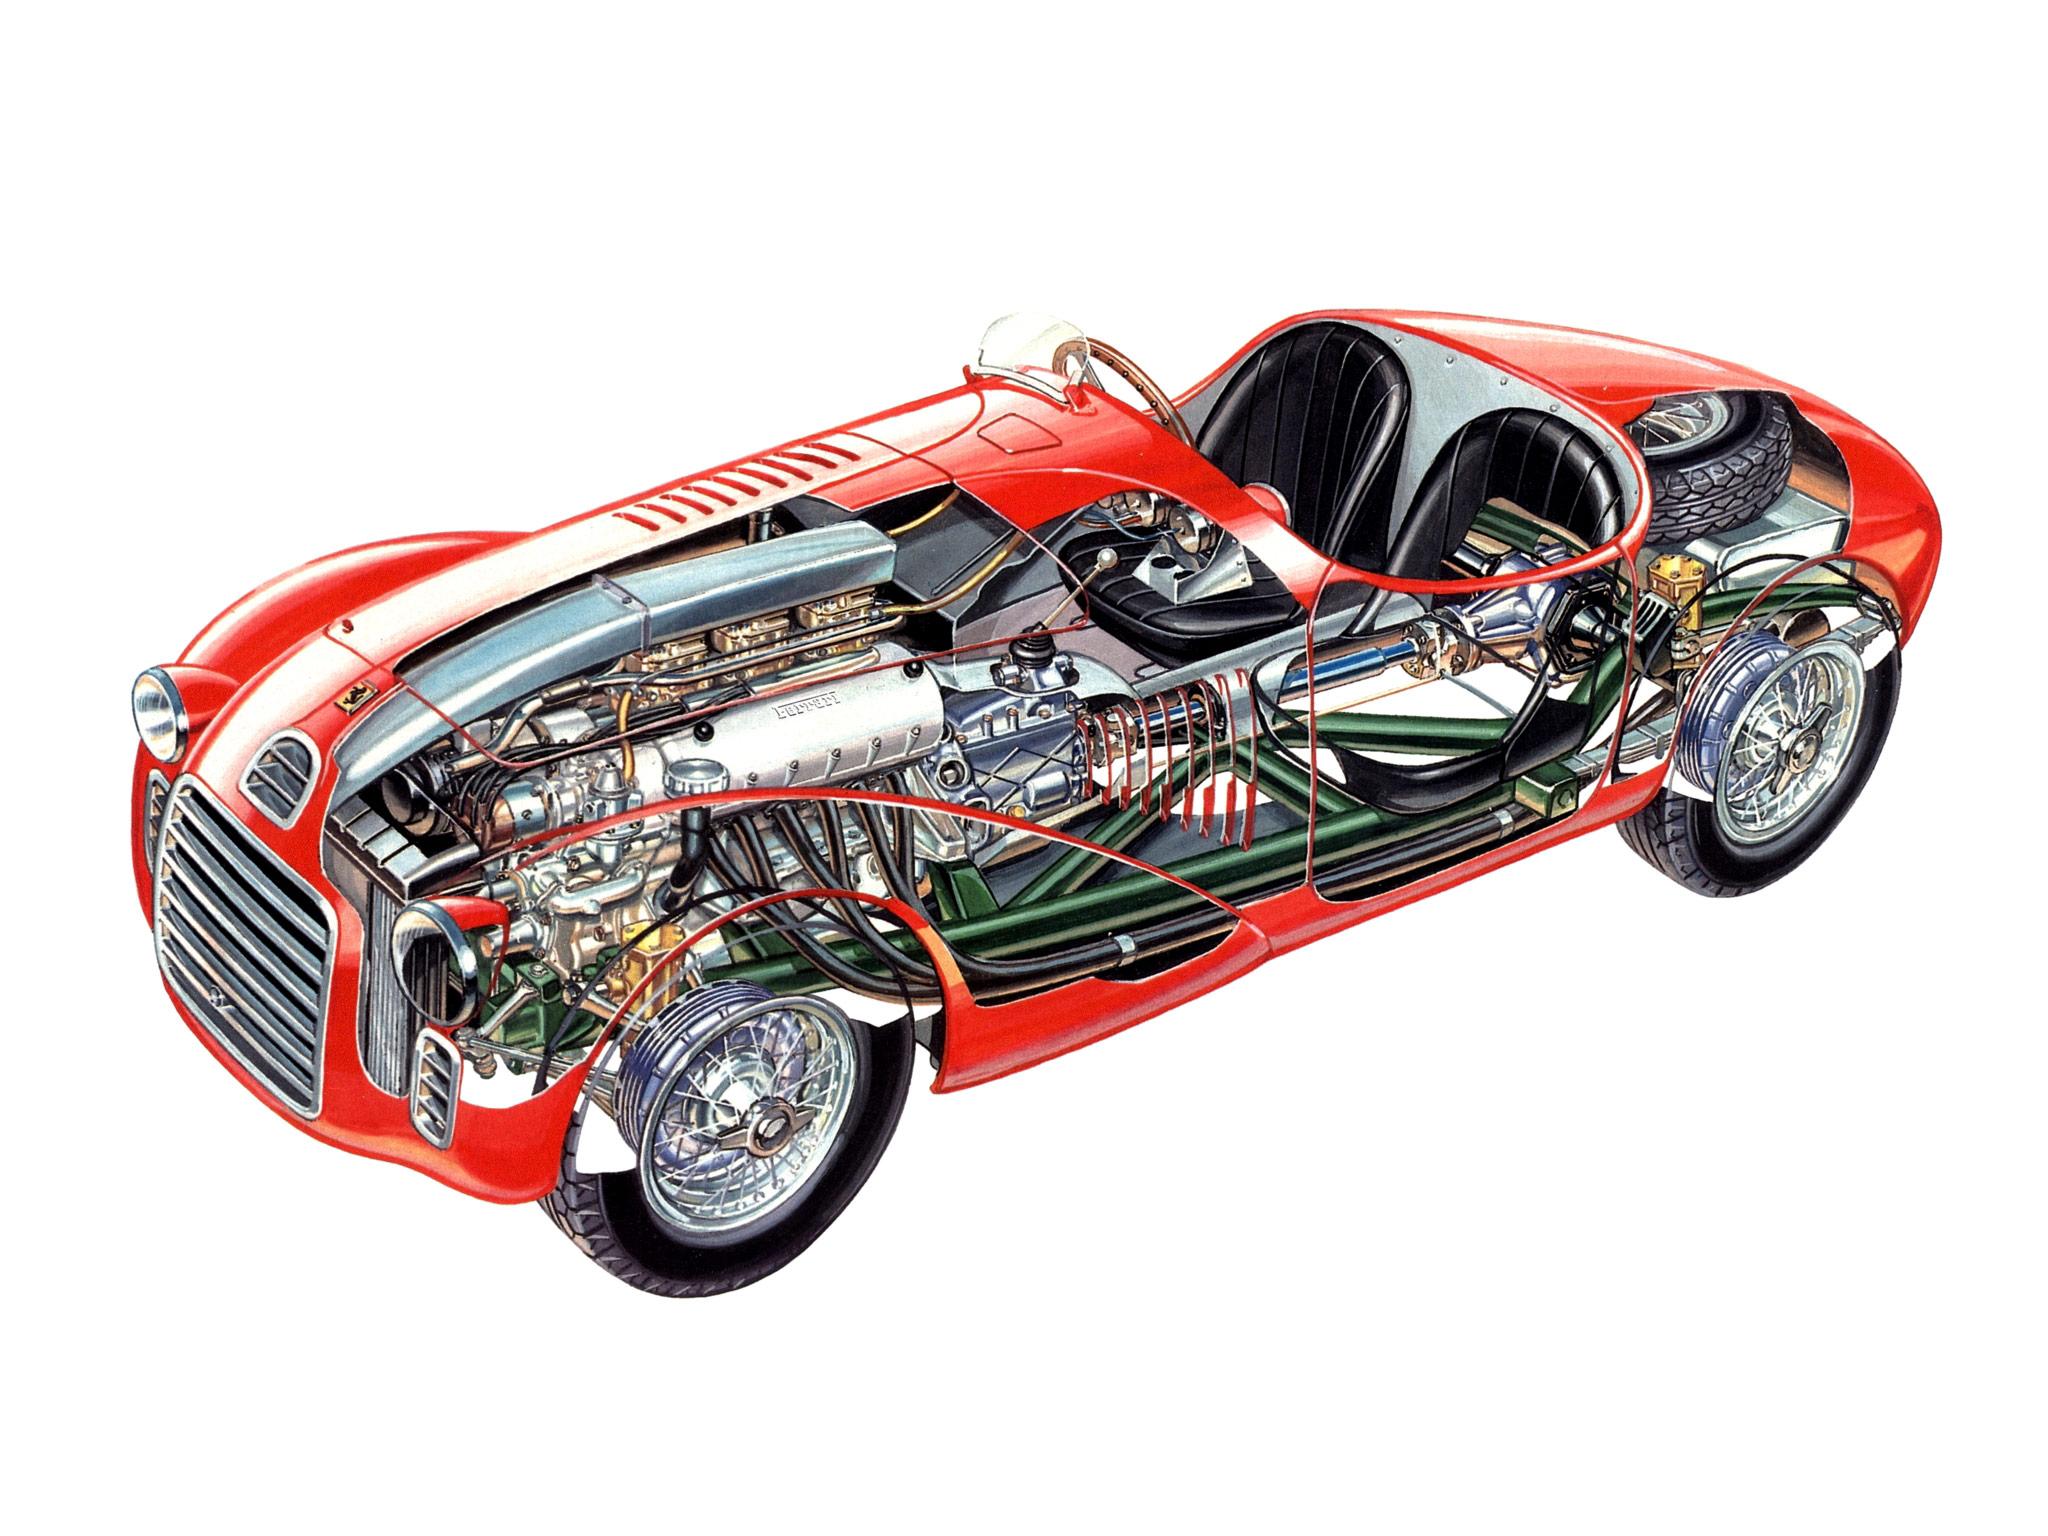 Ferrari 125 S cutaway